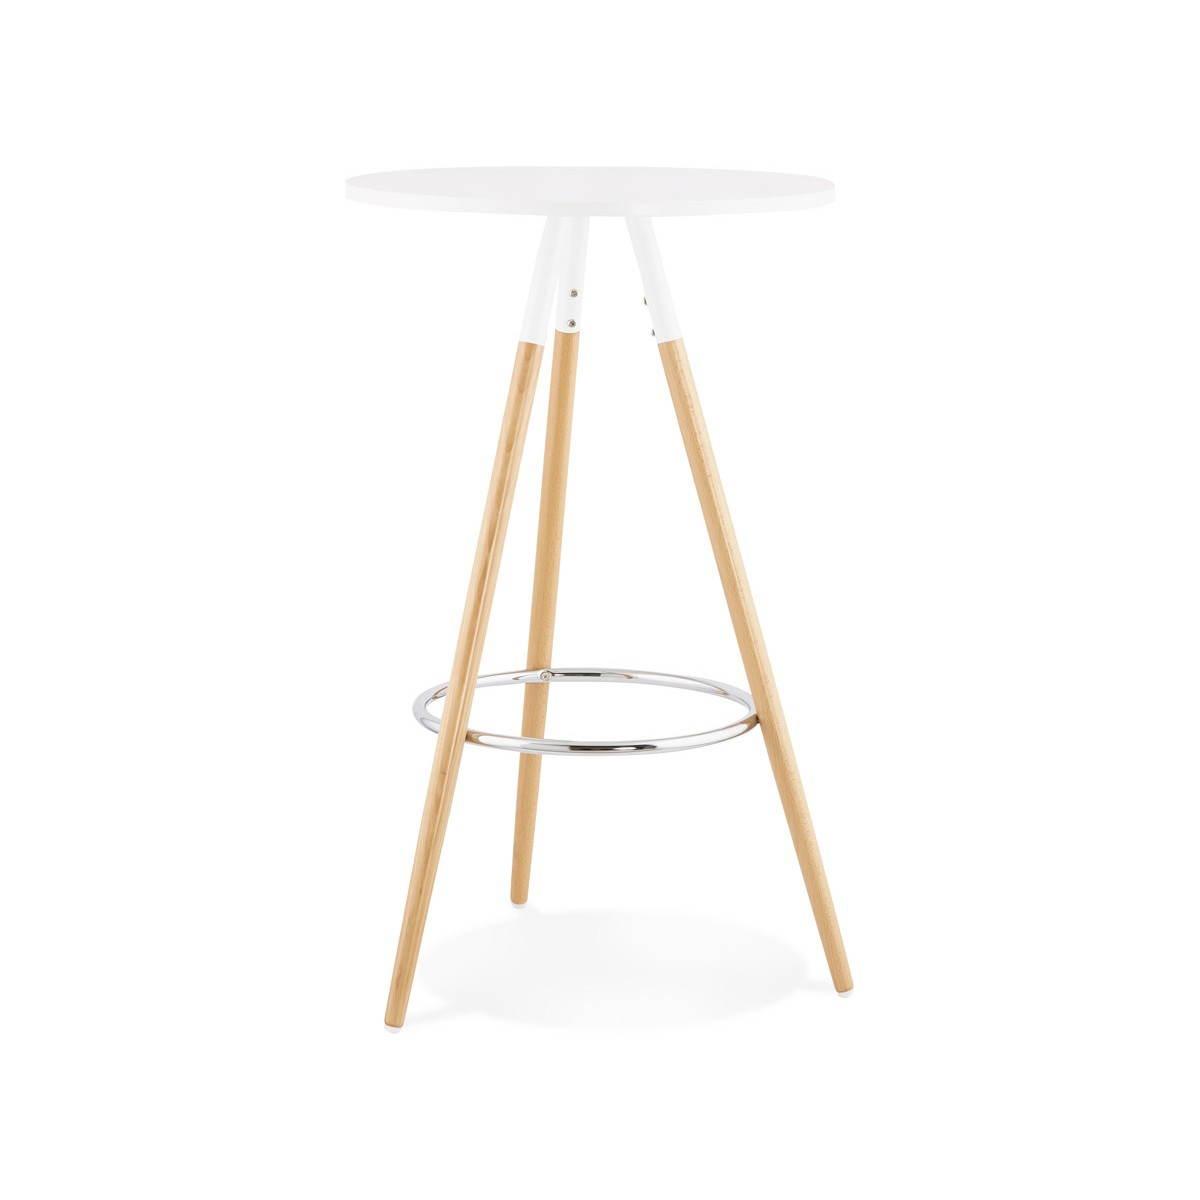 Runder Tisch Skandinavischen Julie Aus Holz O 65 Cm Hoch Weiss Natur